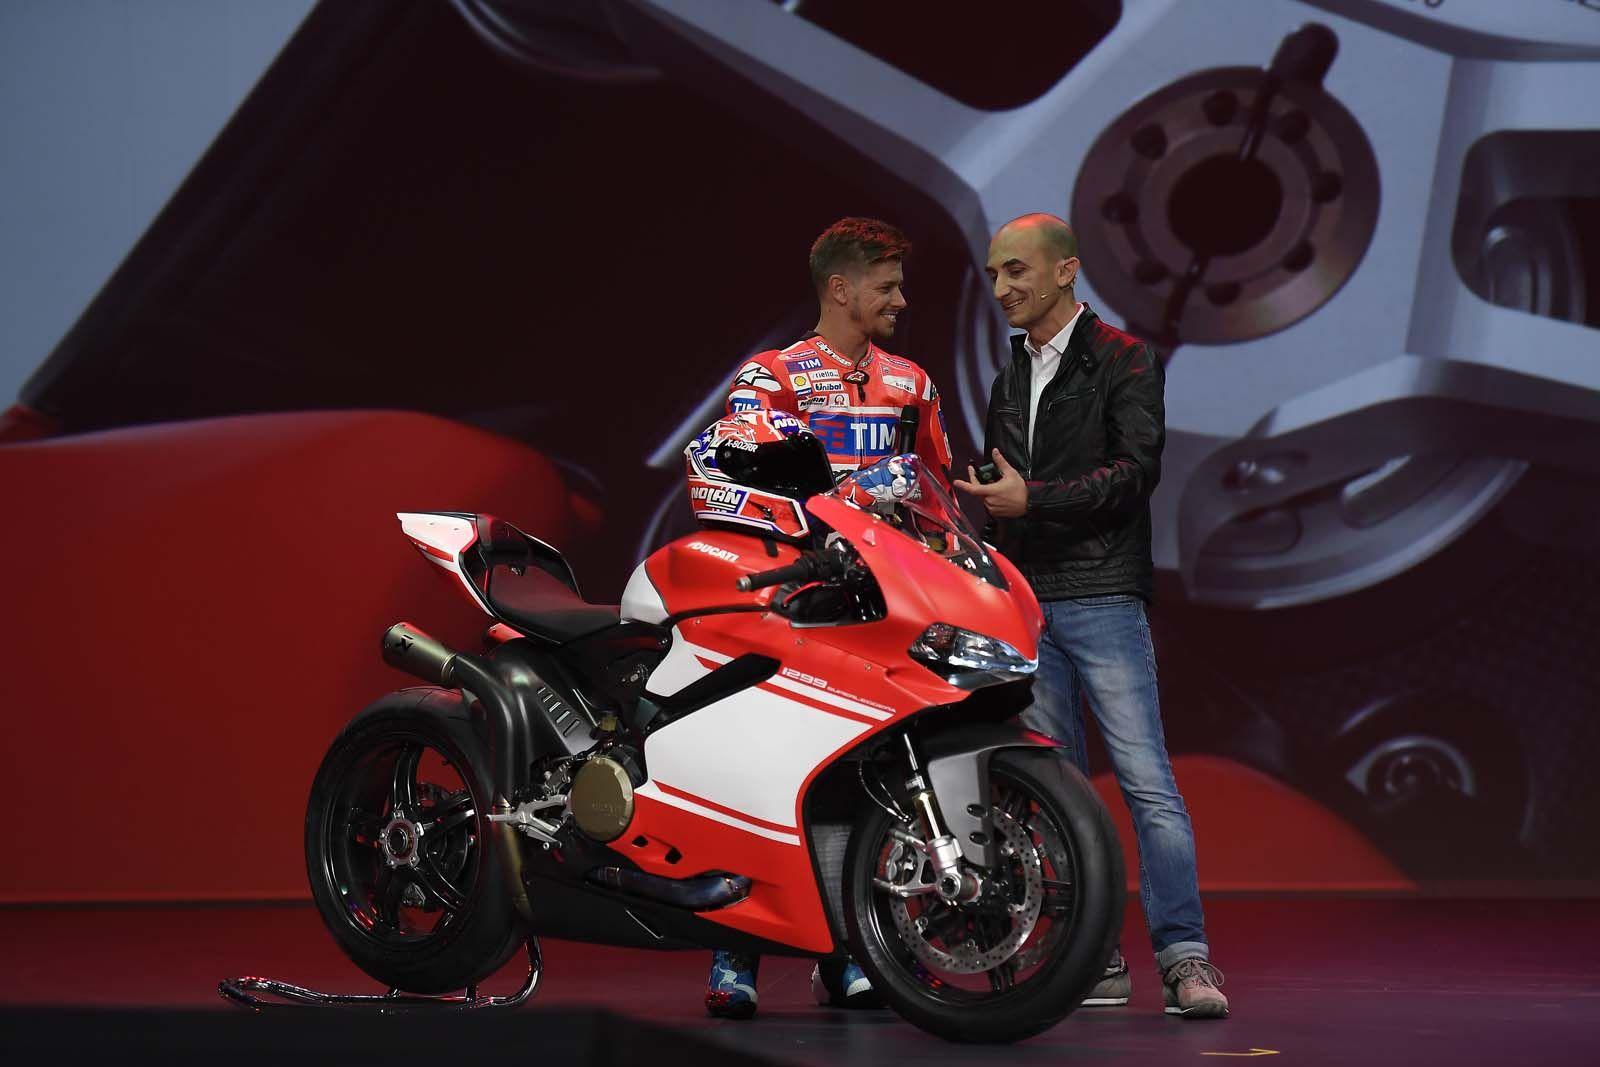 Carbon Fiber Everything Meet The Ducati 1299 Superleggera Eicma